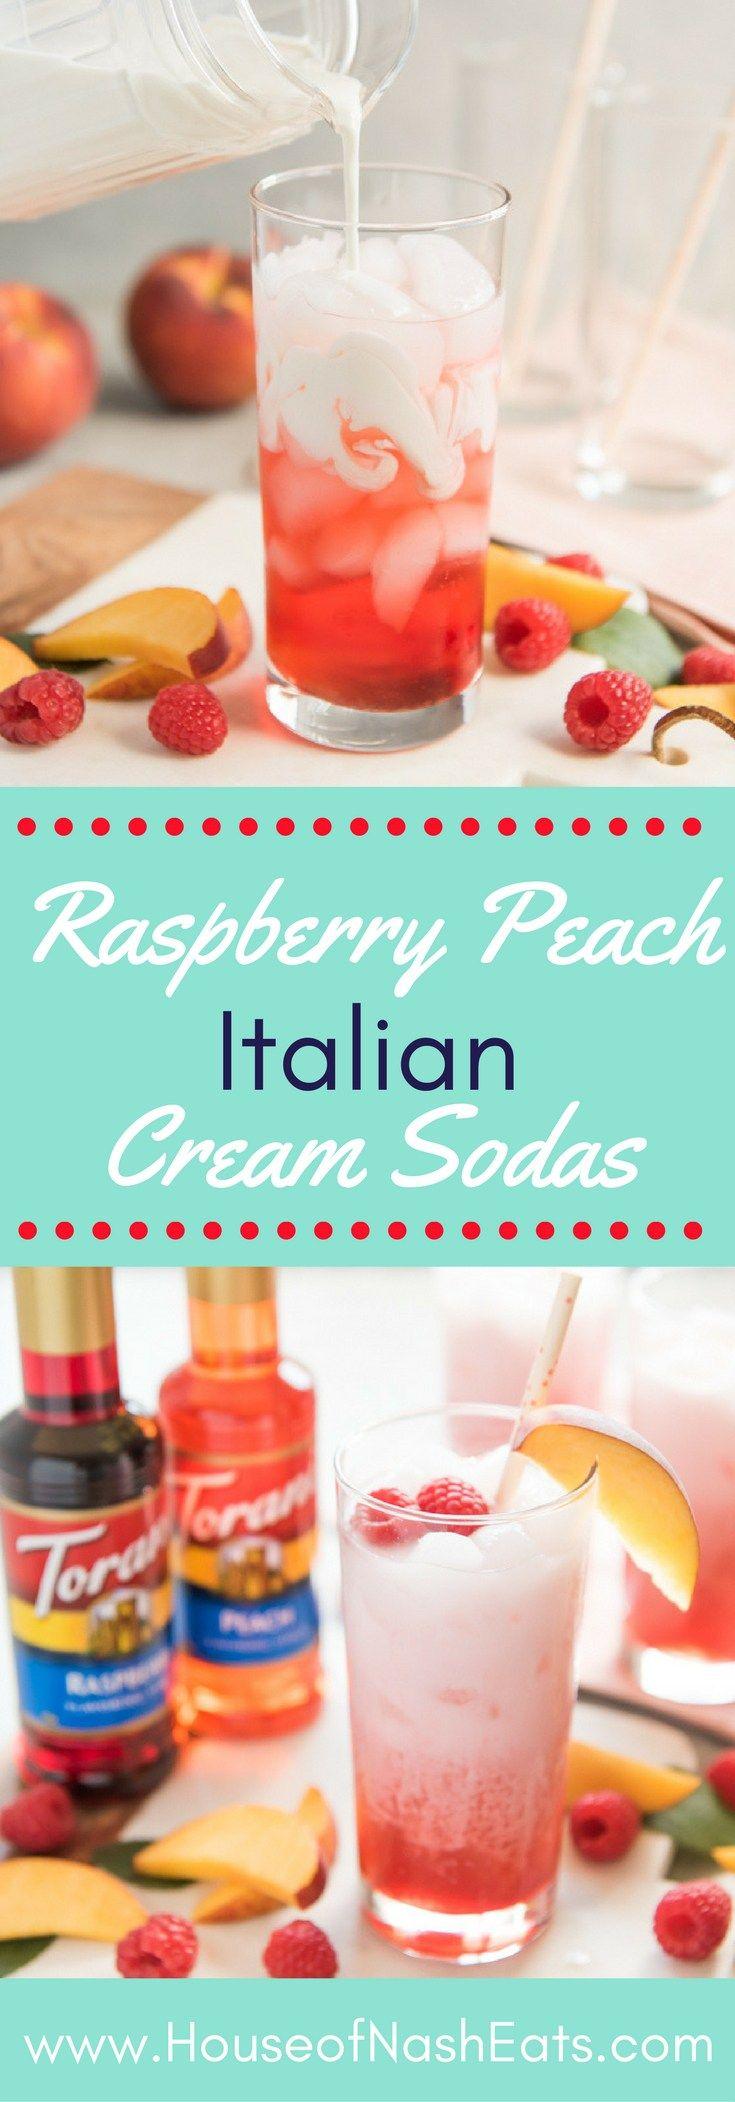 Raspberry Peach Italian Cream Sodas | Recipe | Torani syrup, Cream ...